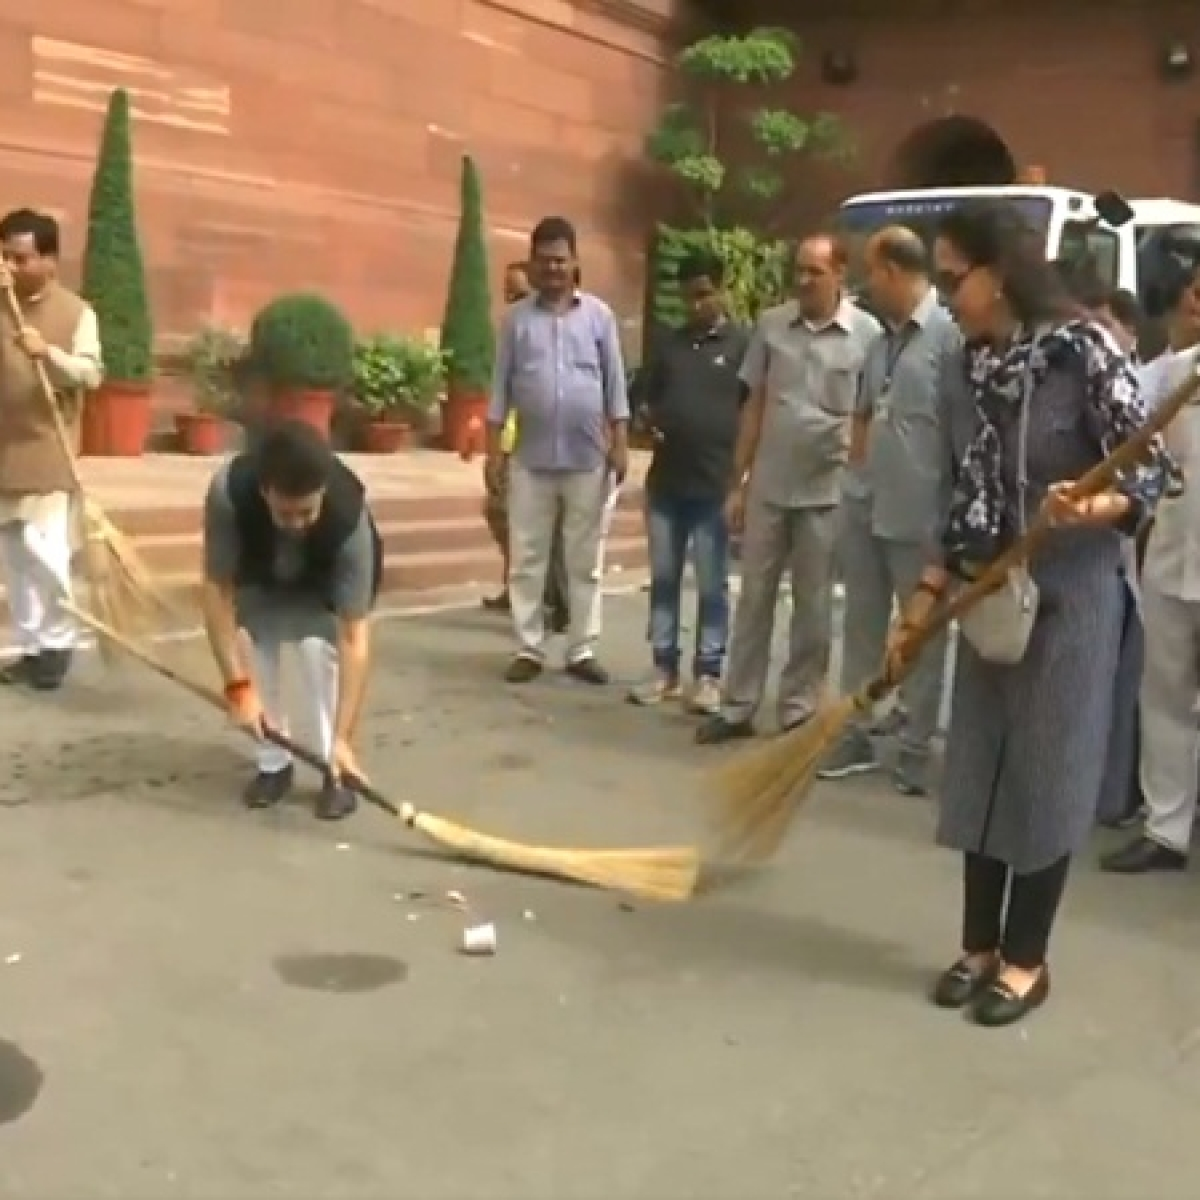 Watch: BJP MPs Anurag Thakur, Hema Malini sweep Parliament premises under Swachh Bharat Abhiyan